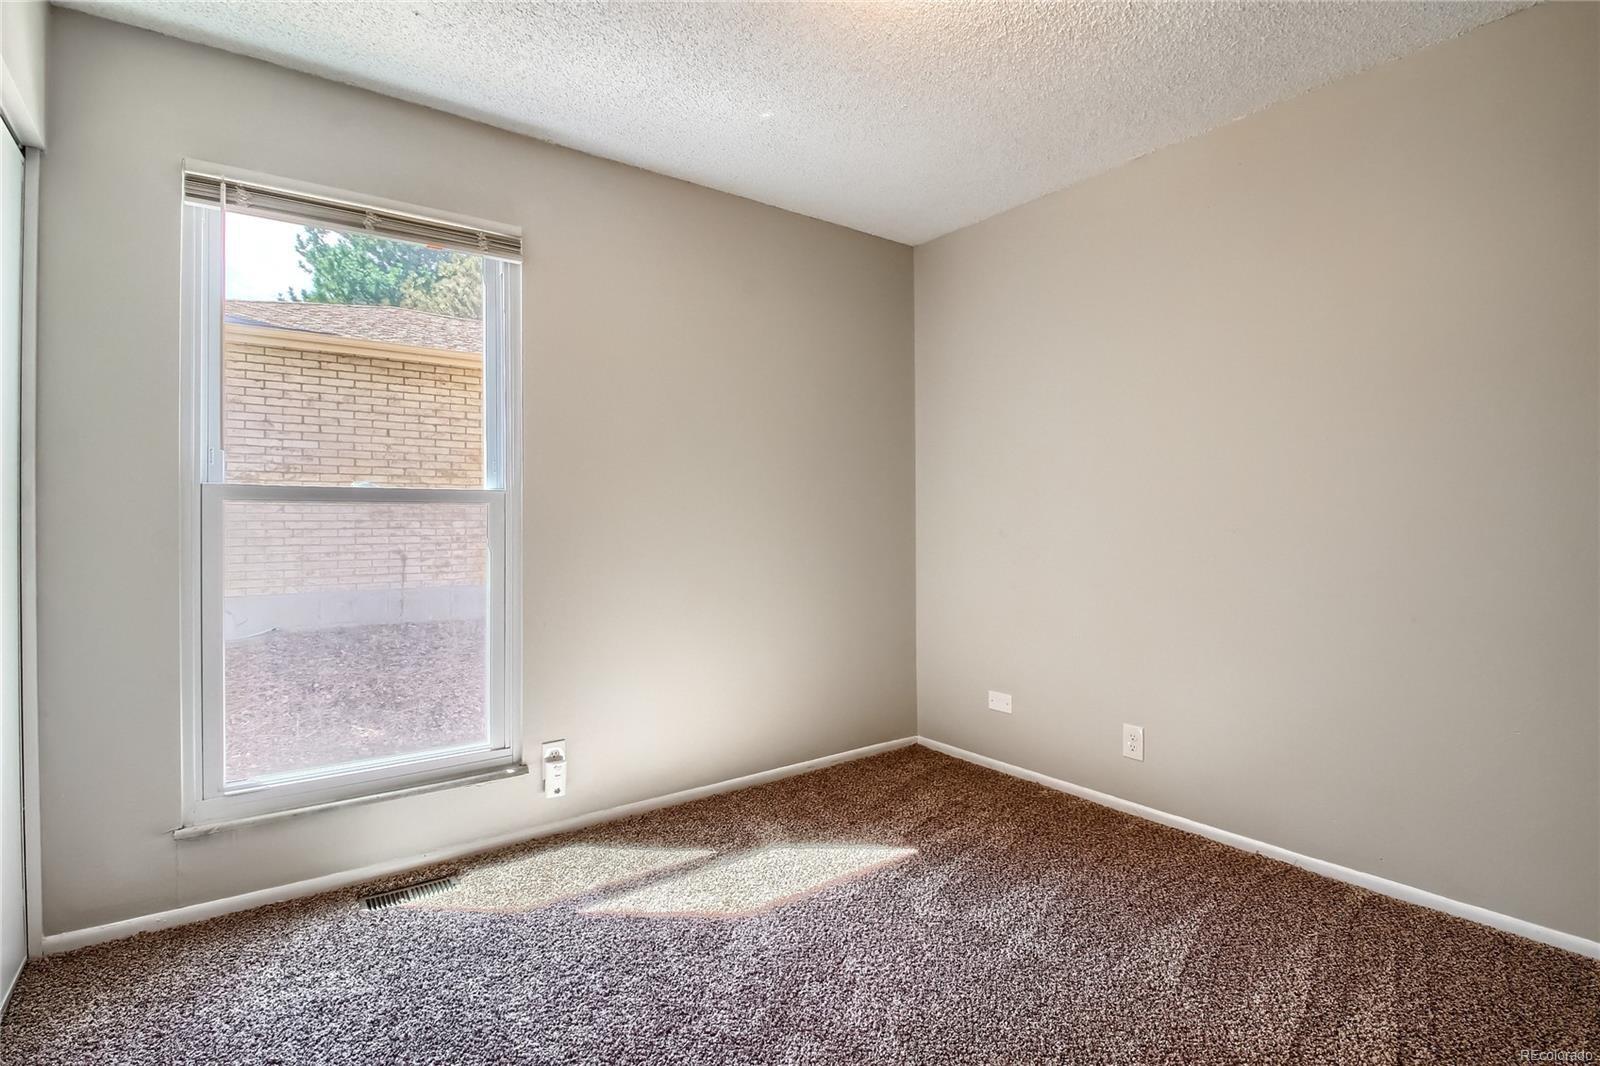 MLS# 4817896 - 28 - 5080 Worchester Street, Denver, CO 80239